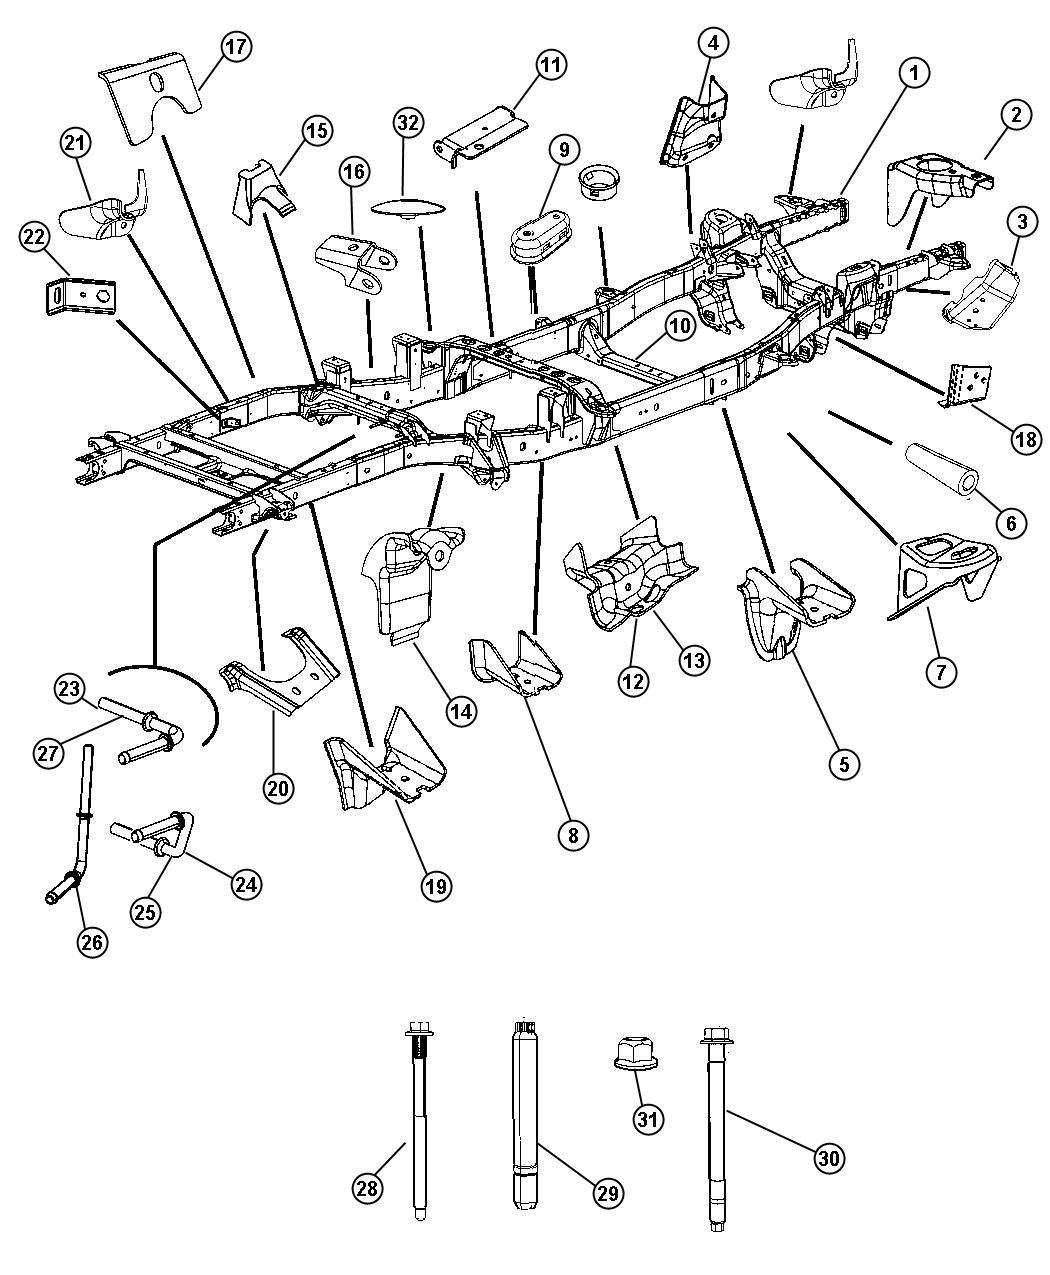 Dodge Ram 3500 Rod. Exhaust pipe support. Front muffler